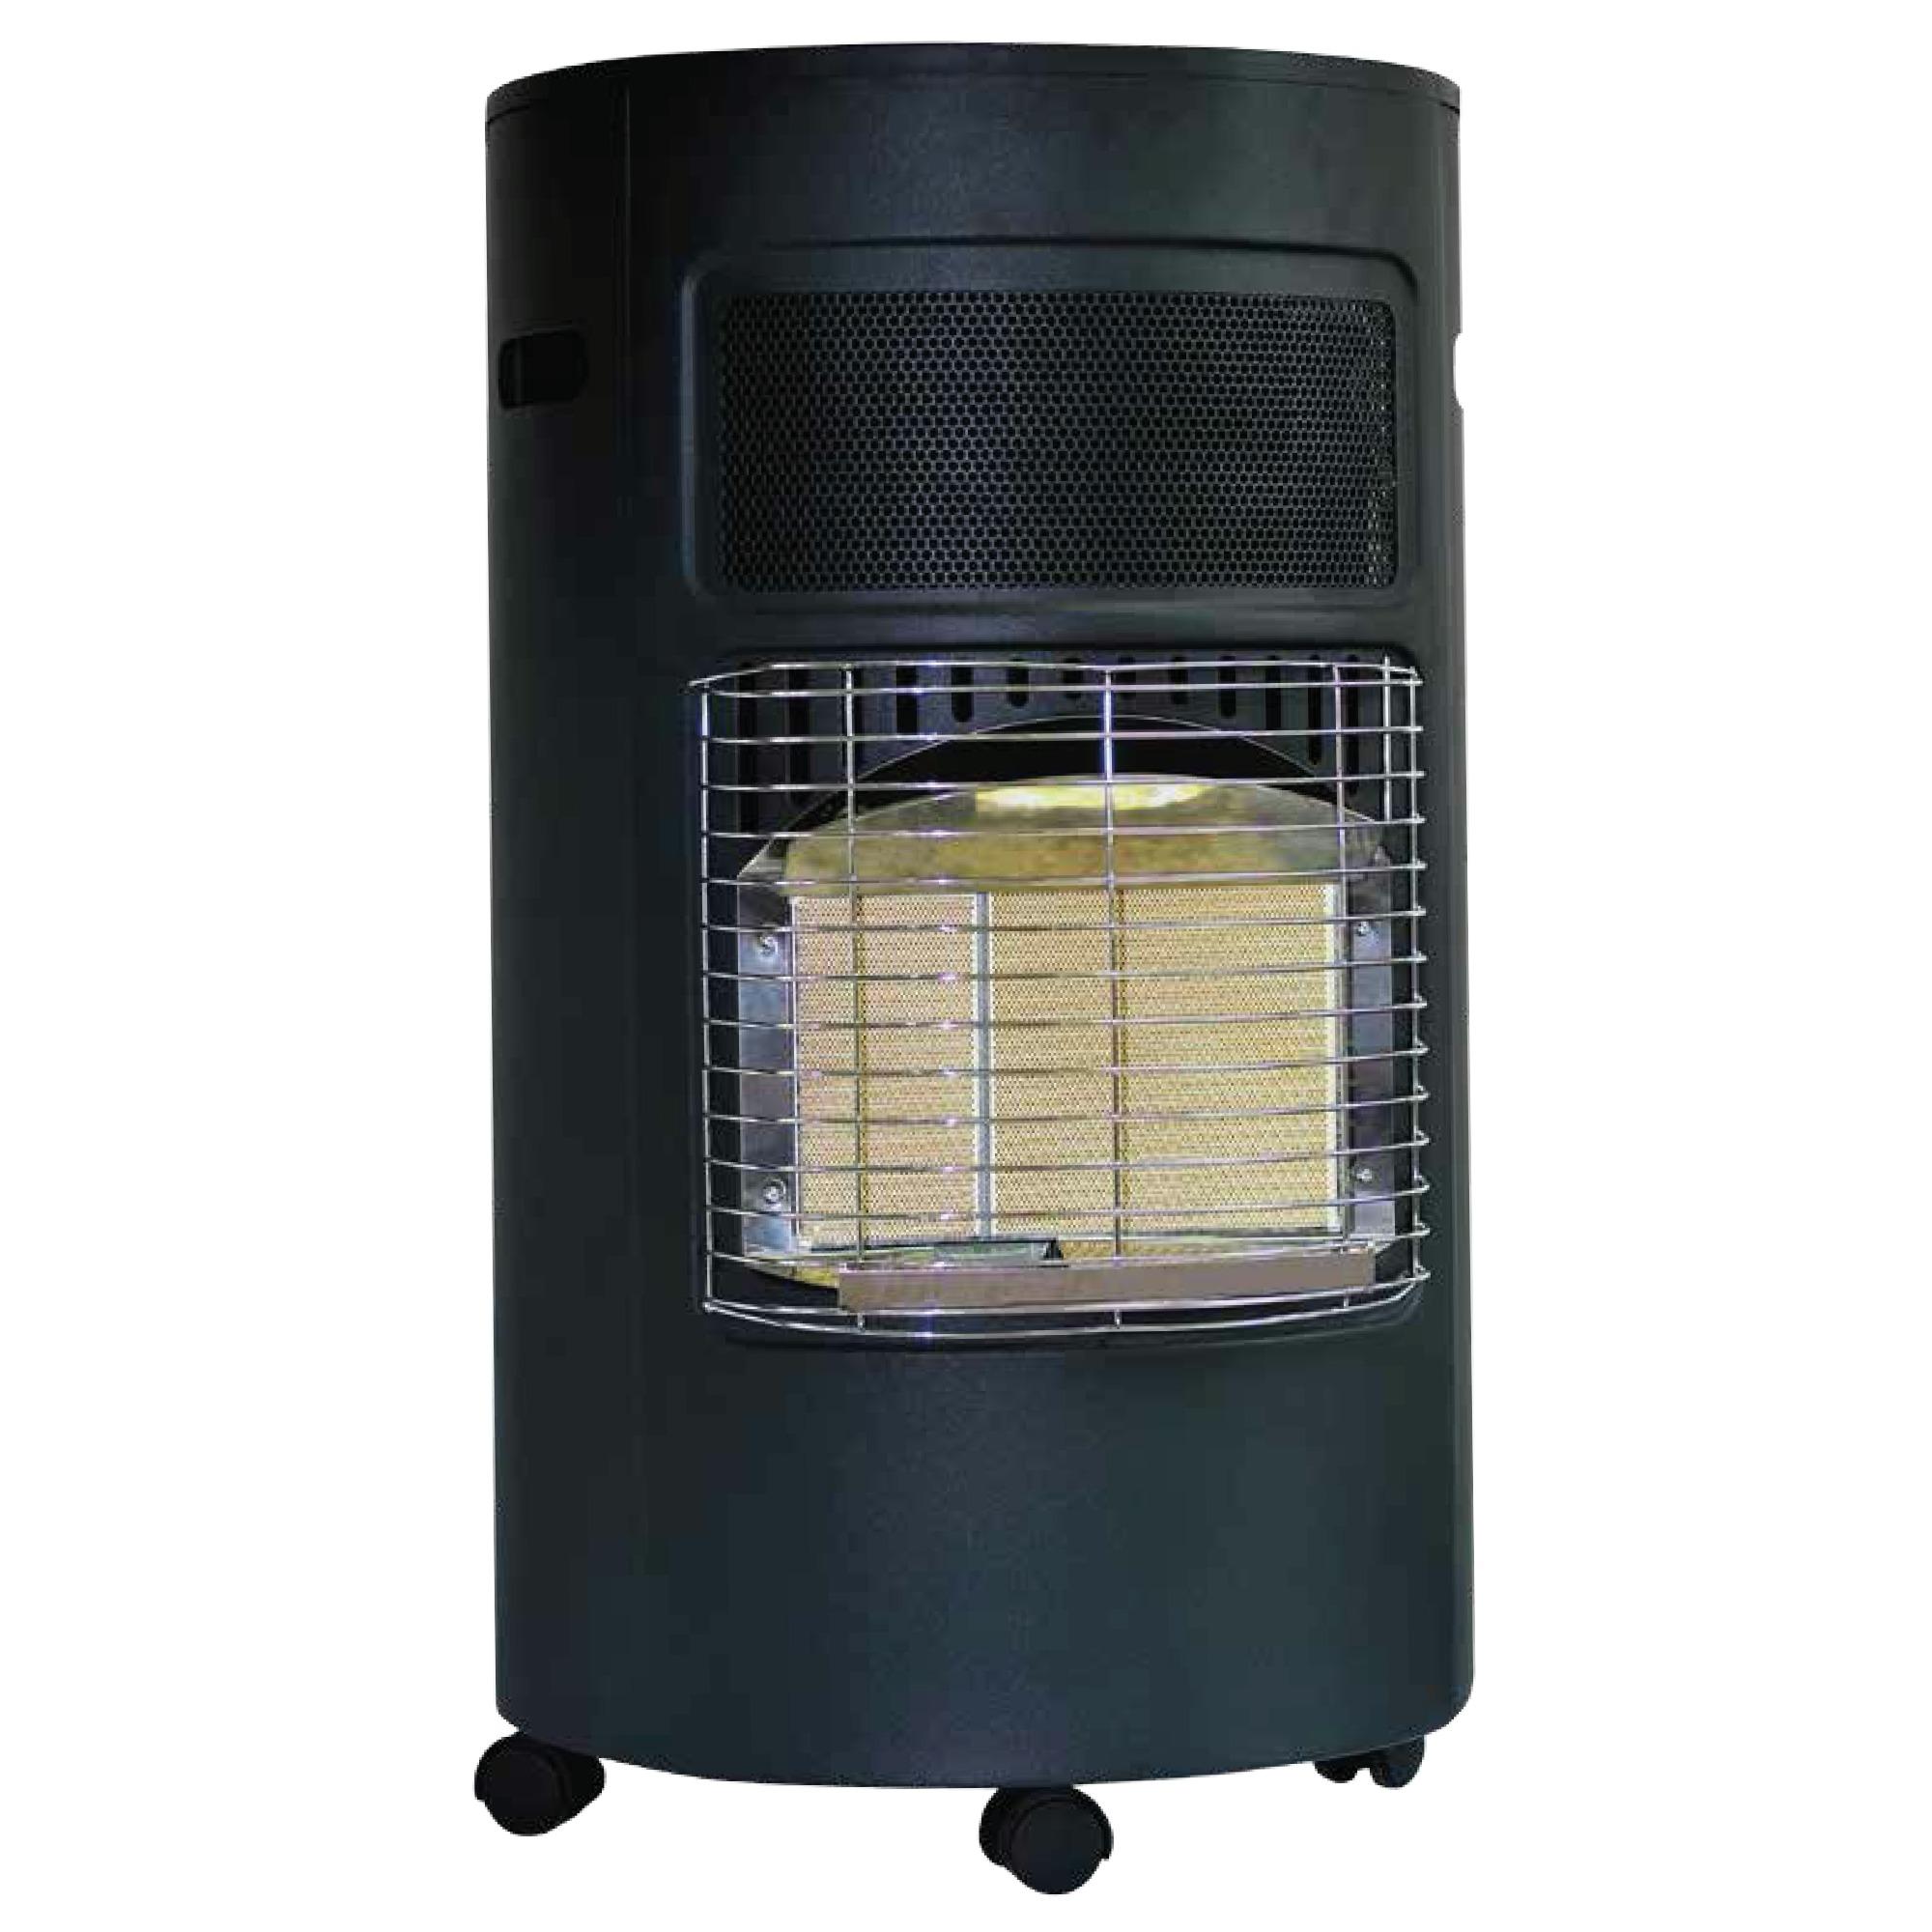 Poêle à gaz Samara 4200 W  Poêles & foyers  Articles saisonniers  ~ Poele A Bois Samara